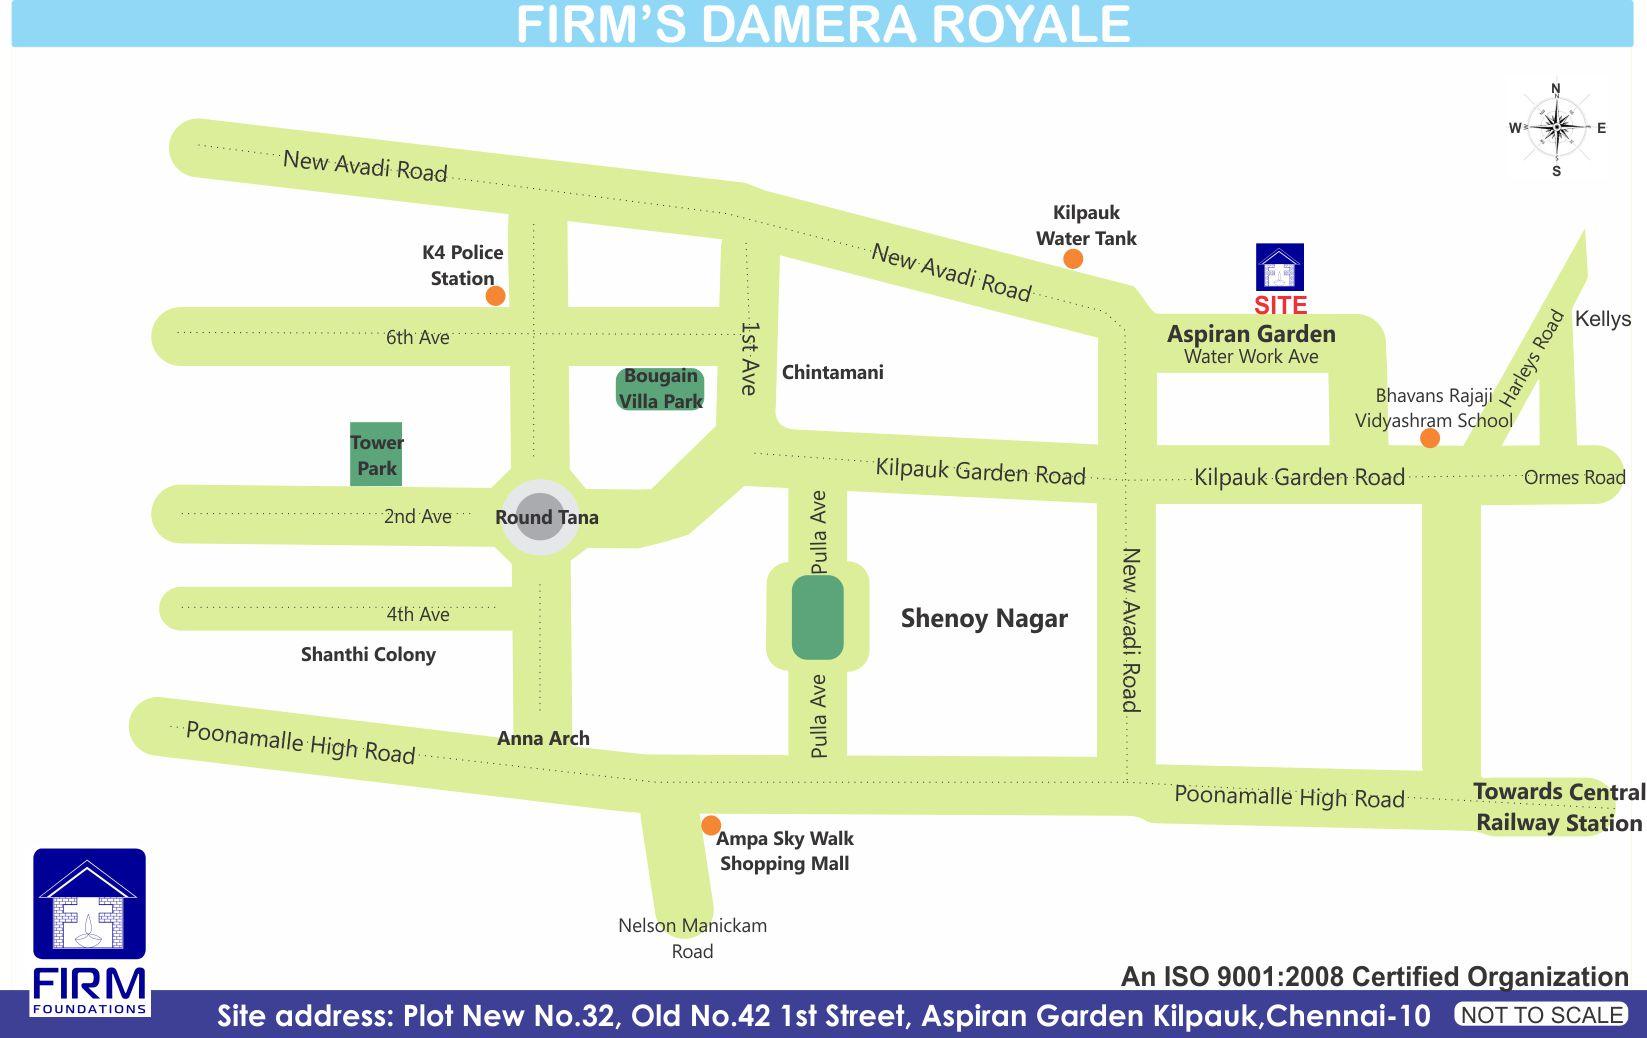 https://www.firmfoundations.in/projects/location/thumbnails/13727648681Aspiran_Garden_New.jpg